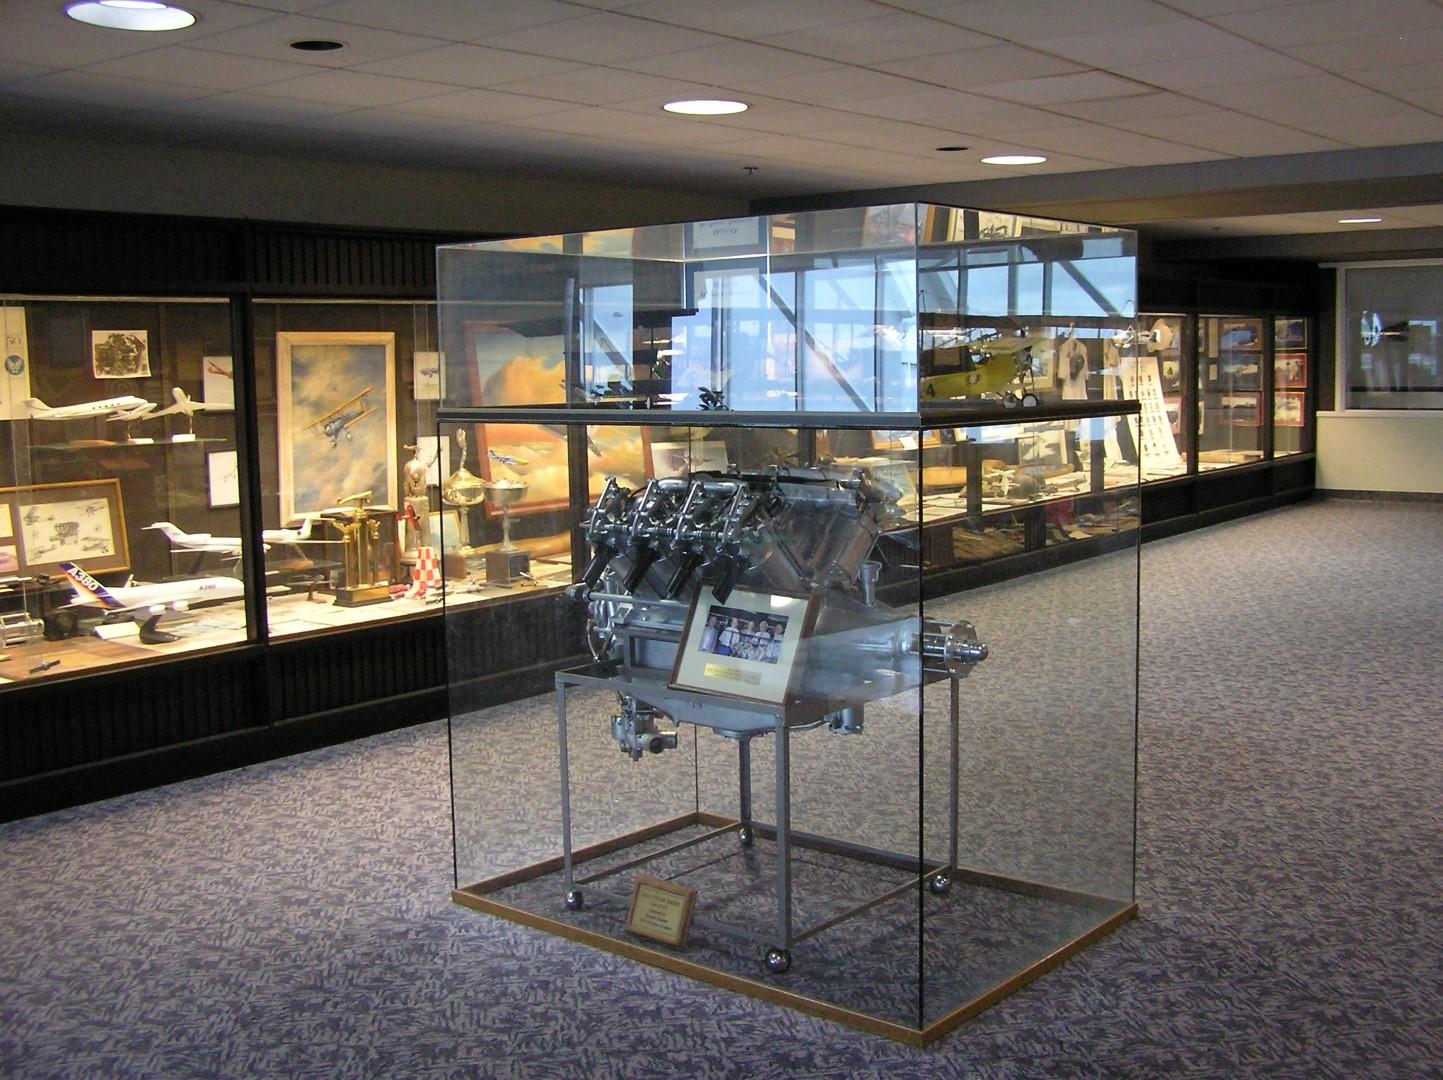 Fort Wayne International Airport - Aviation Museum